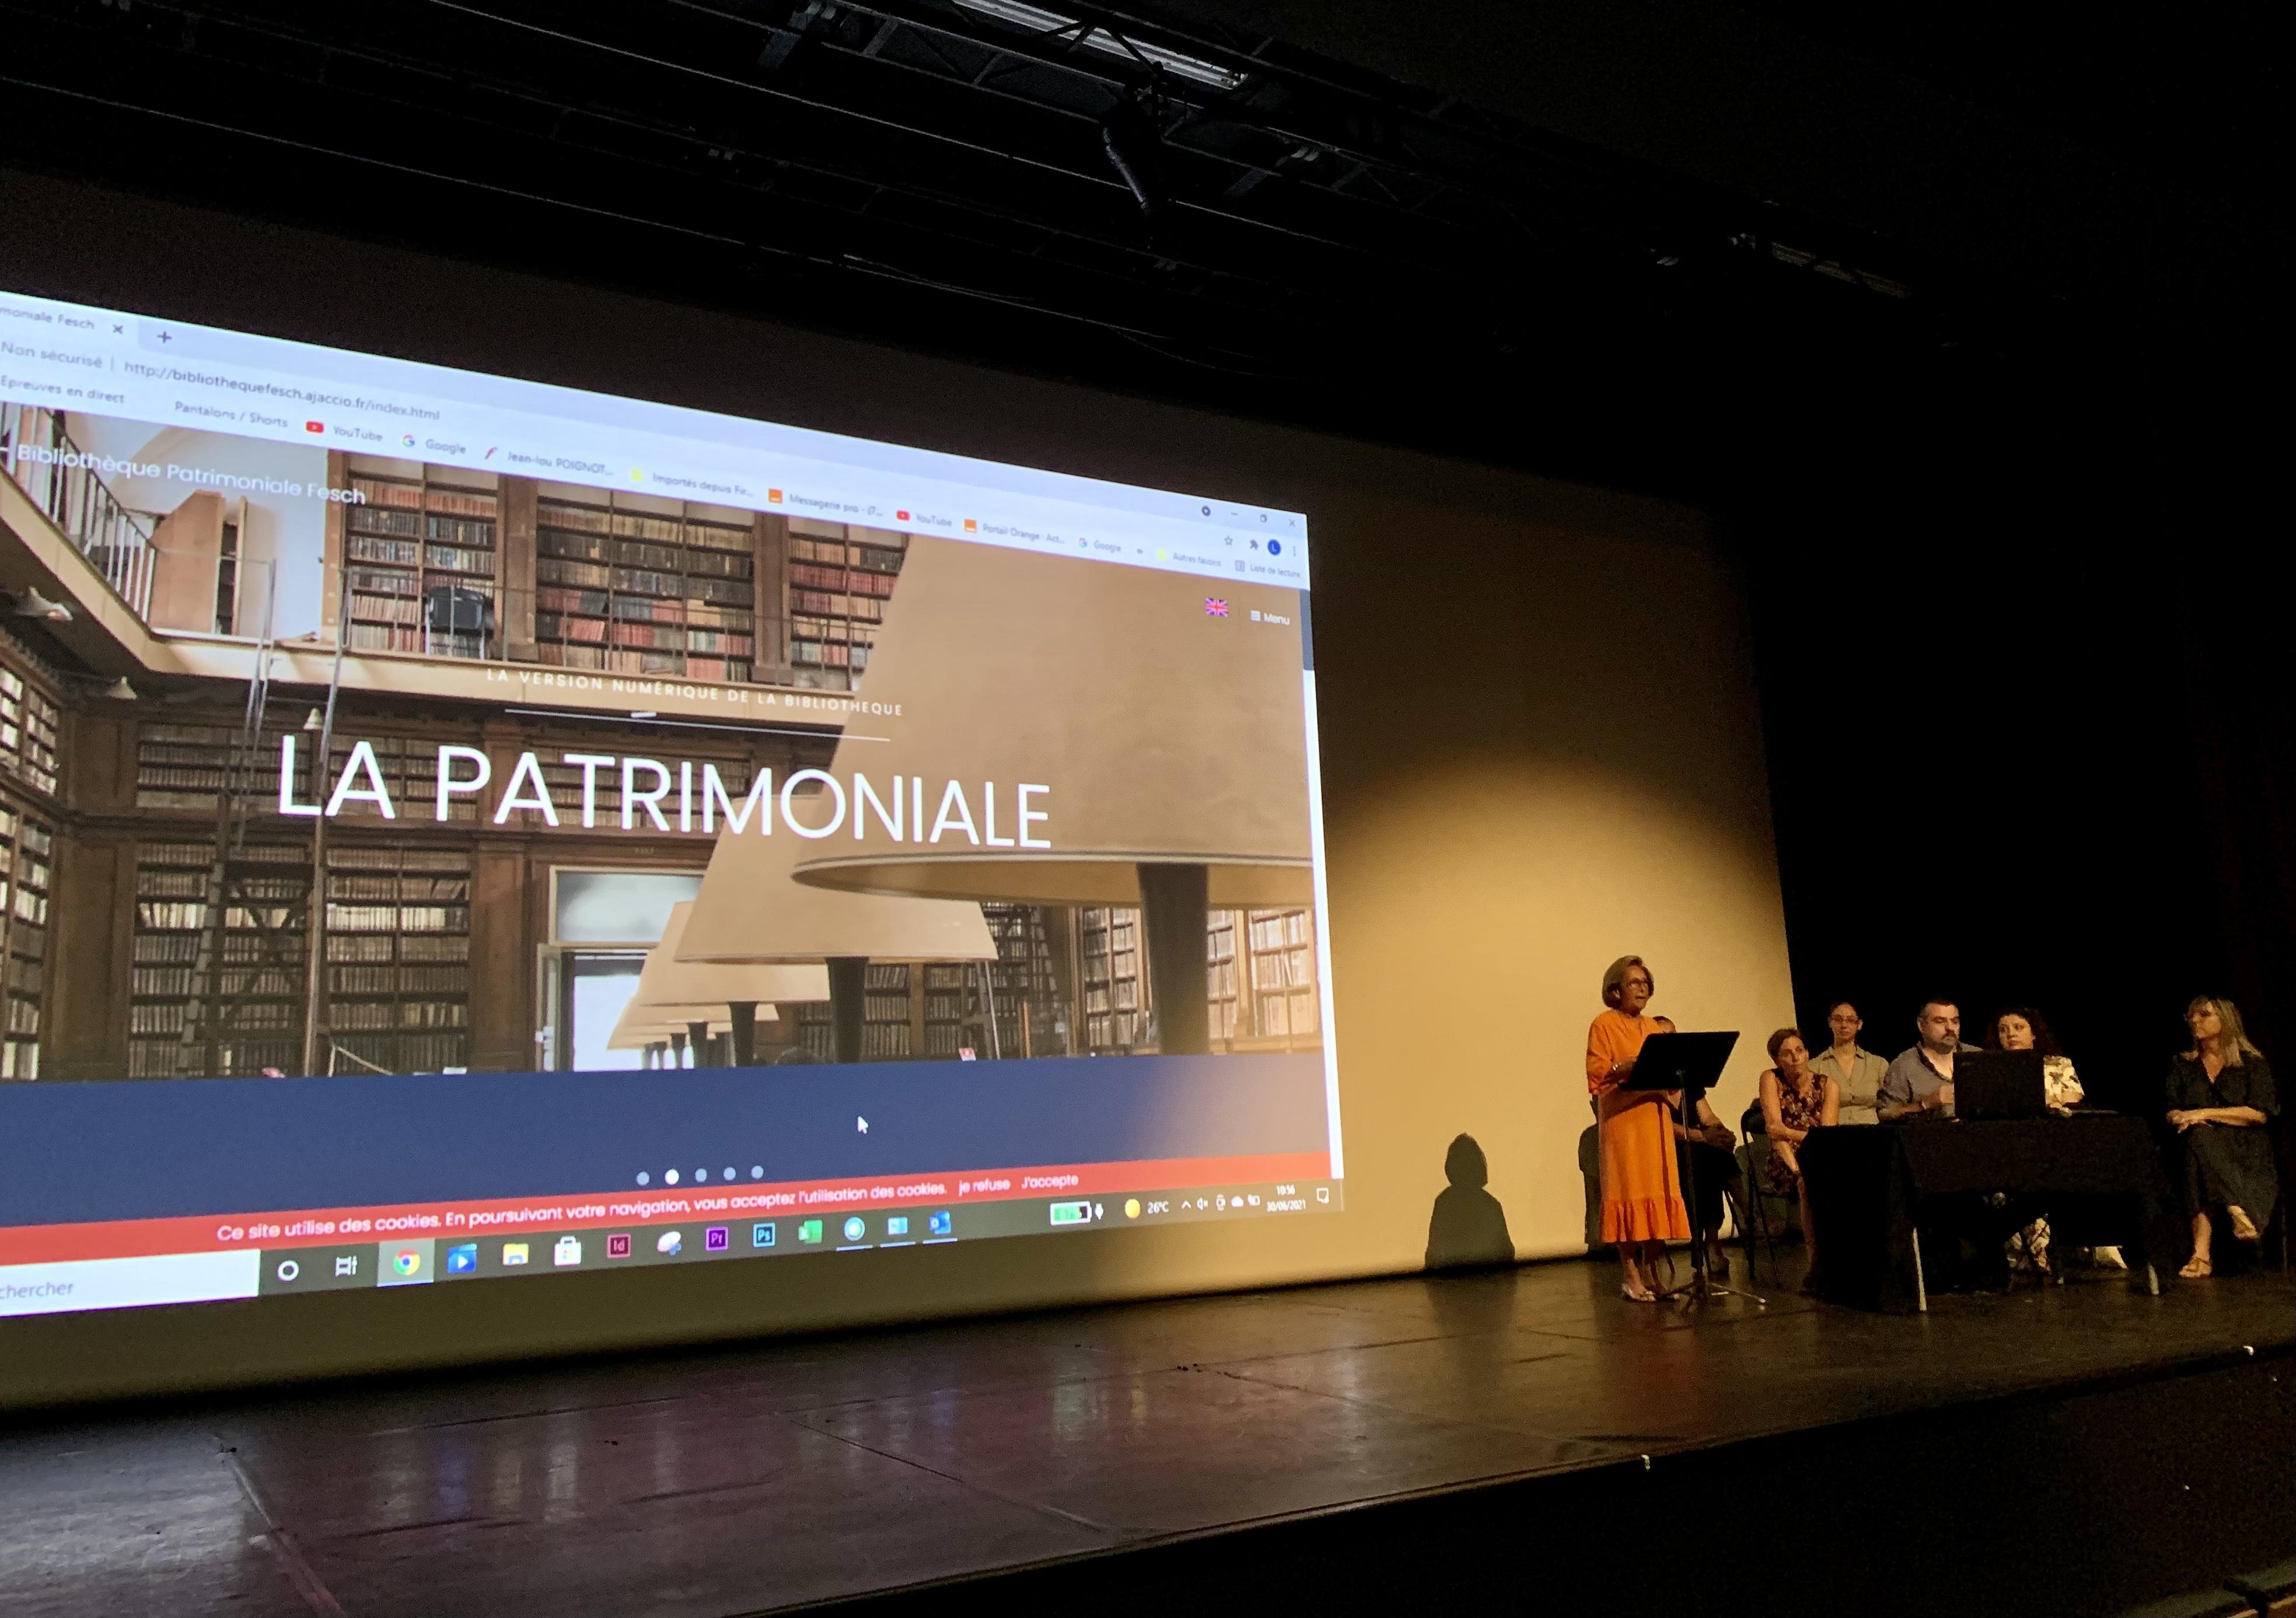 La conférence de presse de présentation de cette exposition inédite ce mercredi 30 juin à Ajaccio